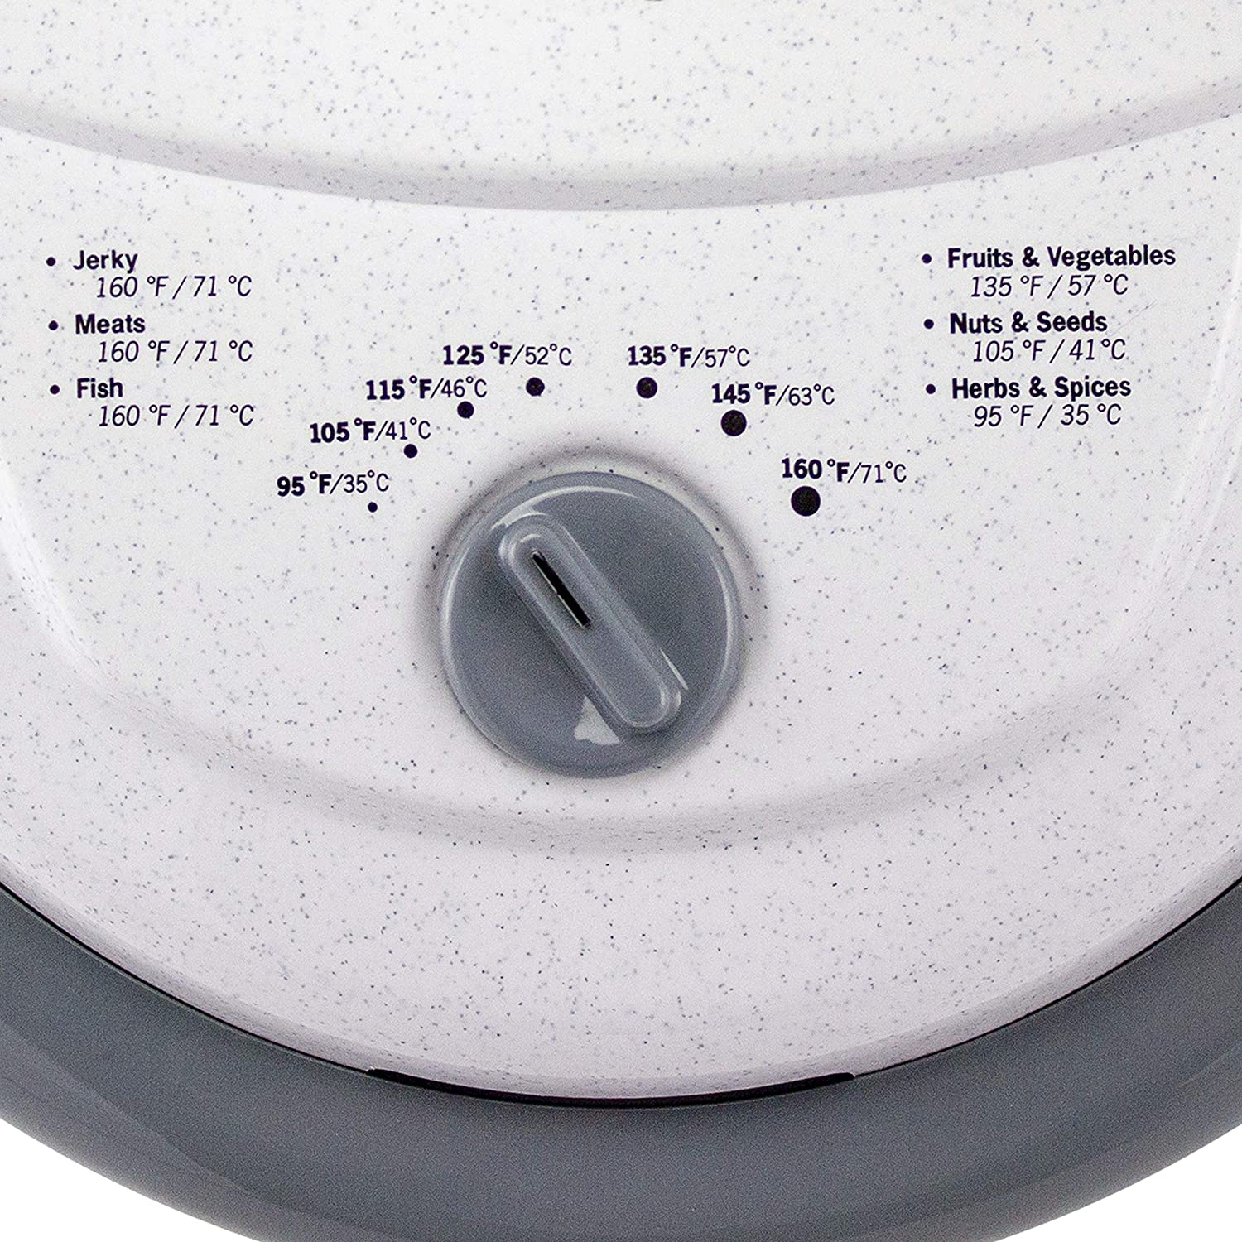 Nesco(ネスコ)スナックマスター 食品乾燥機 FD-75A【並行輸入】の商品画像7